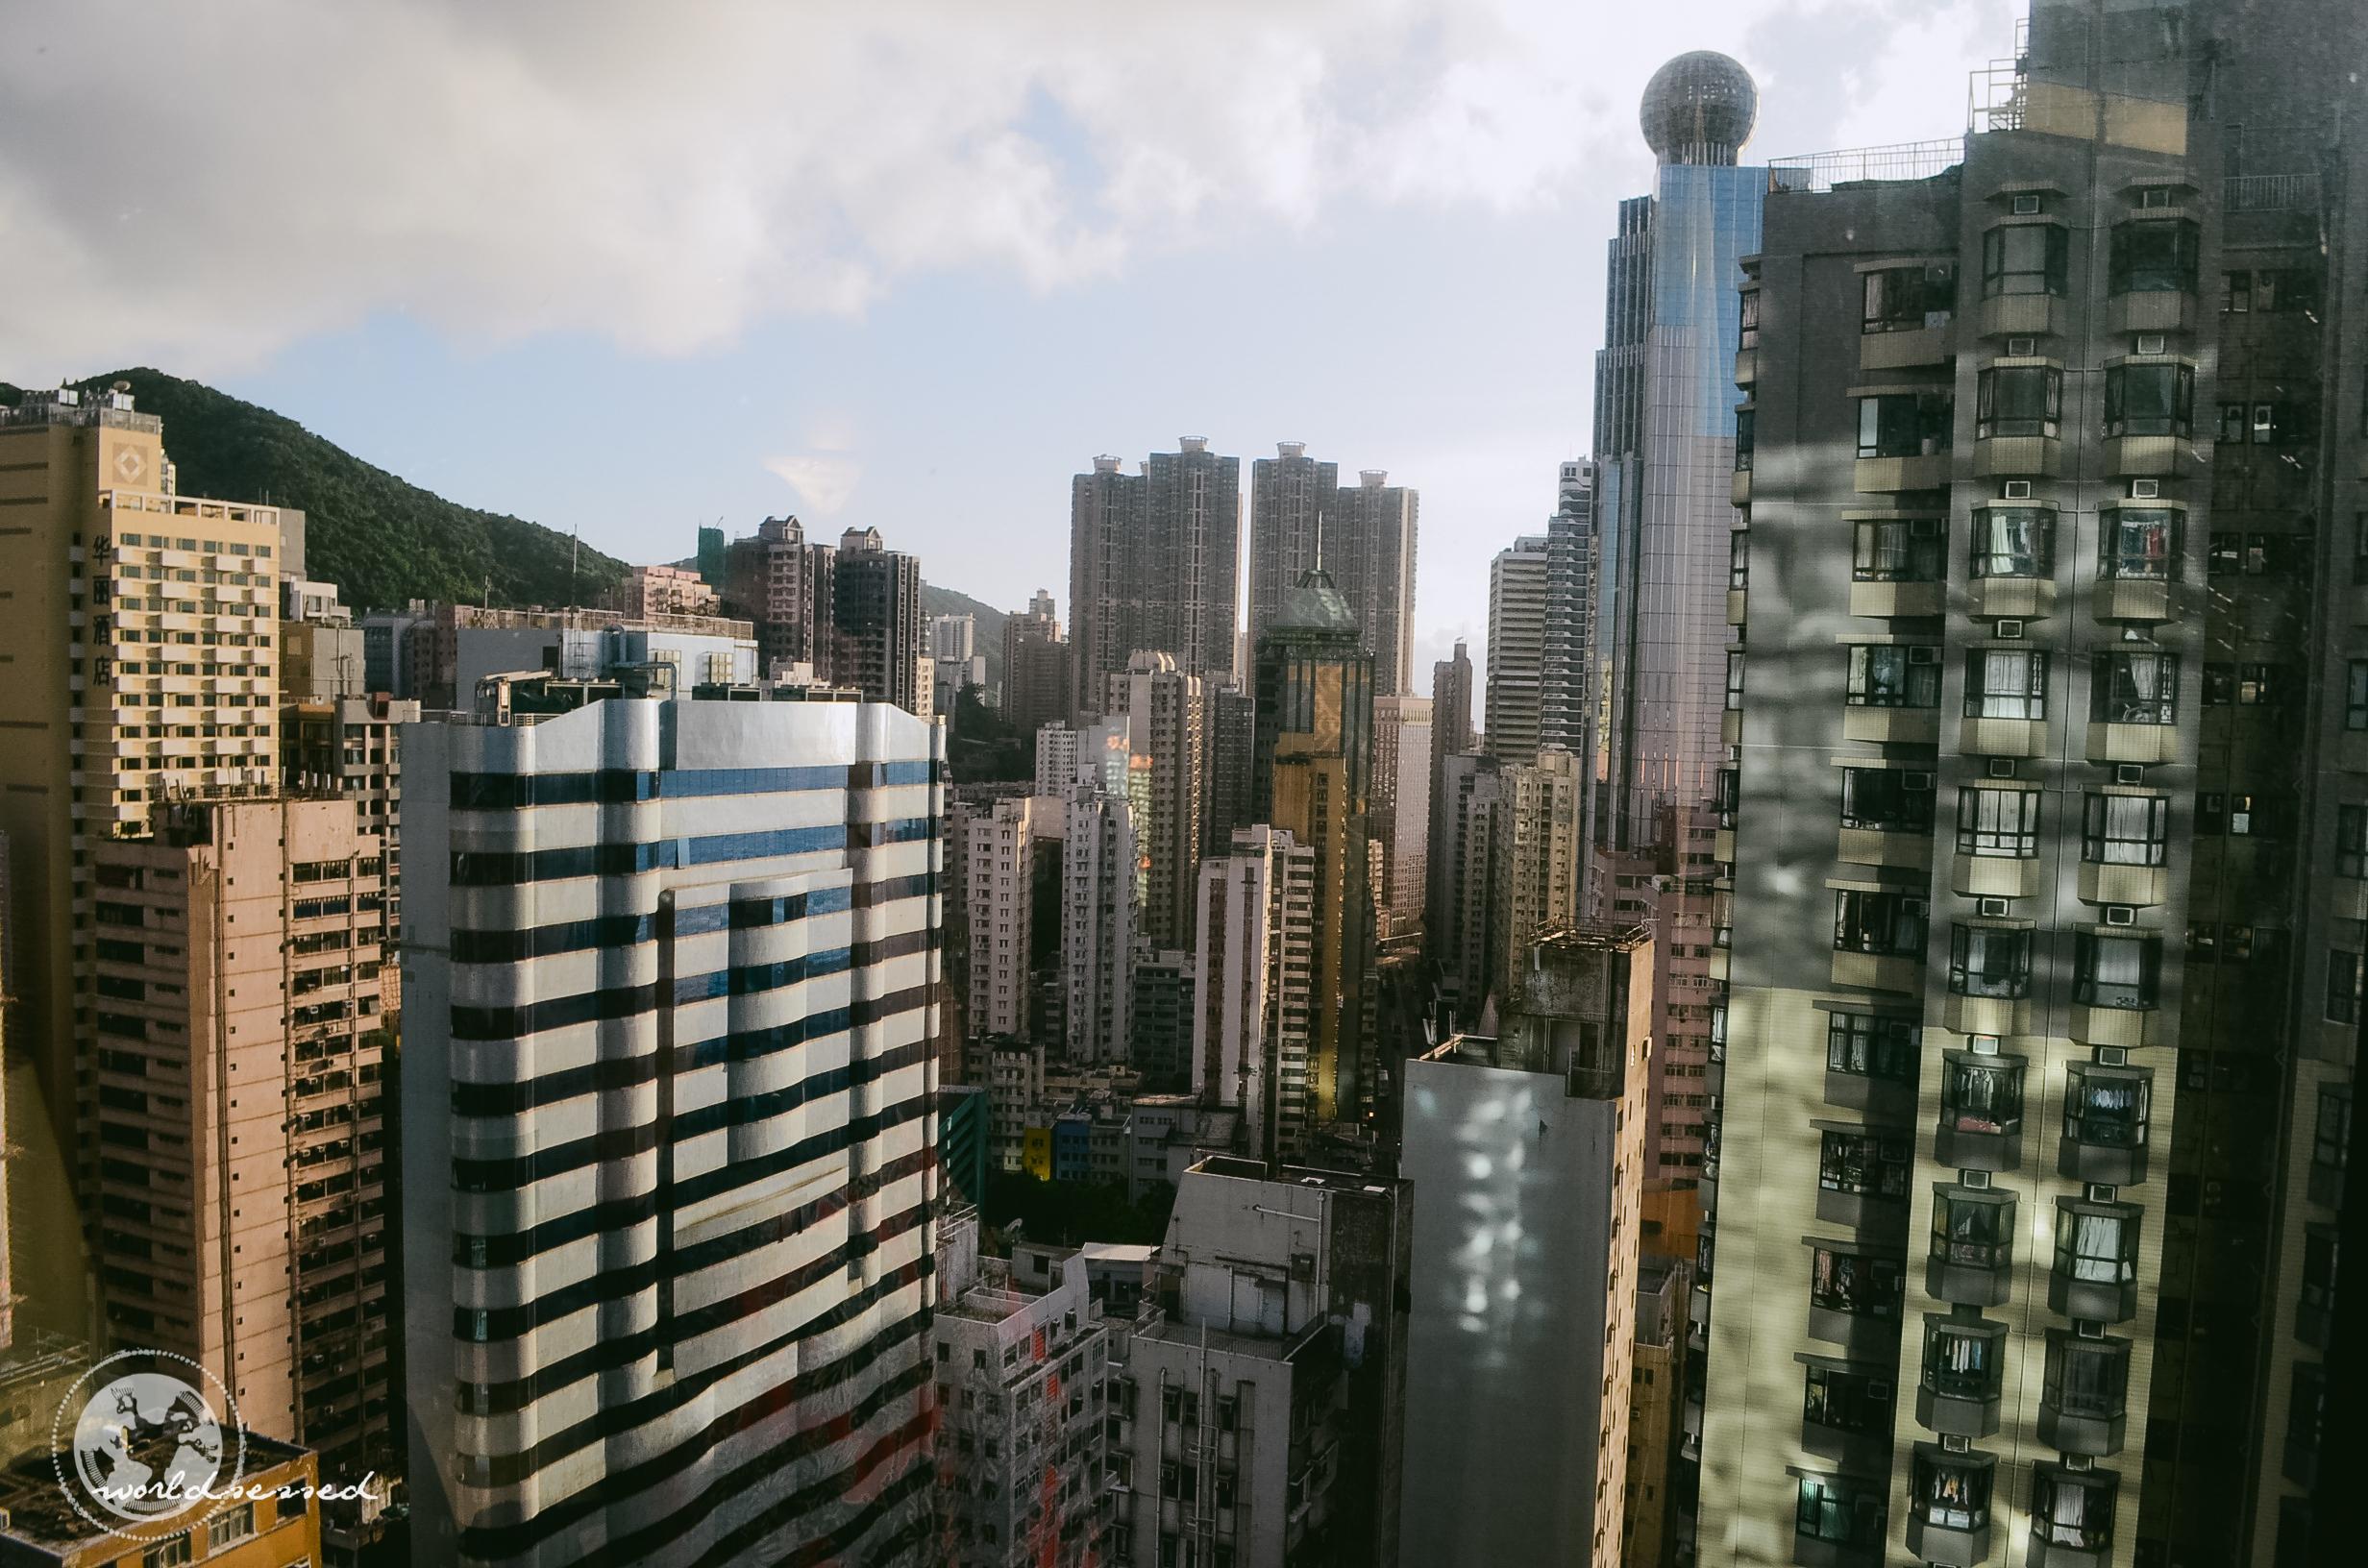 $$ Hotel Review: Island Pacific Hotel Hong Kong